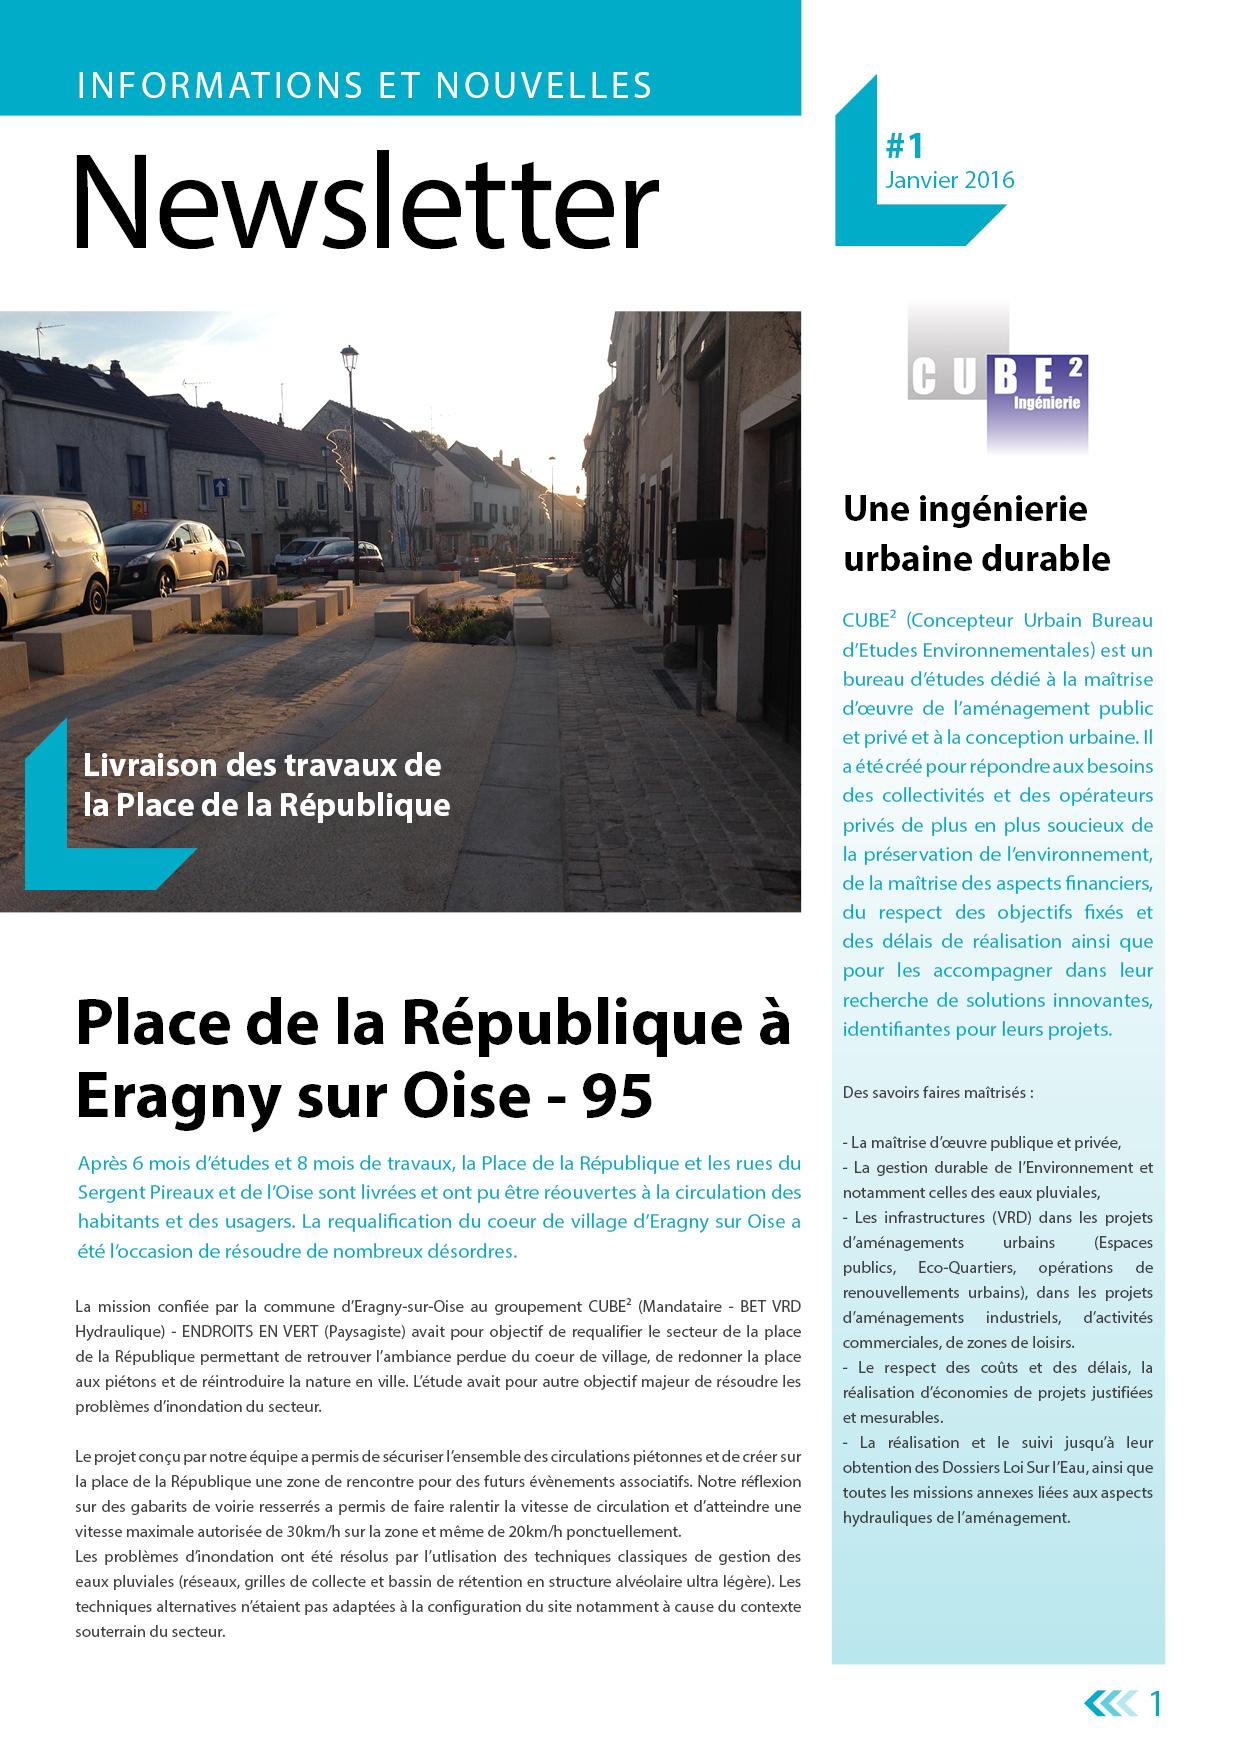 Newsletter n°1 - Janvier 2016